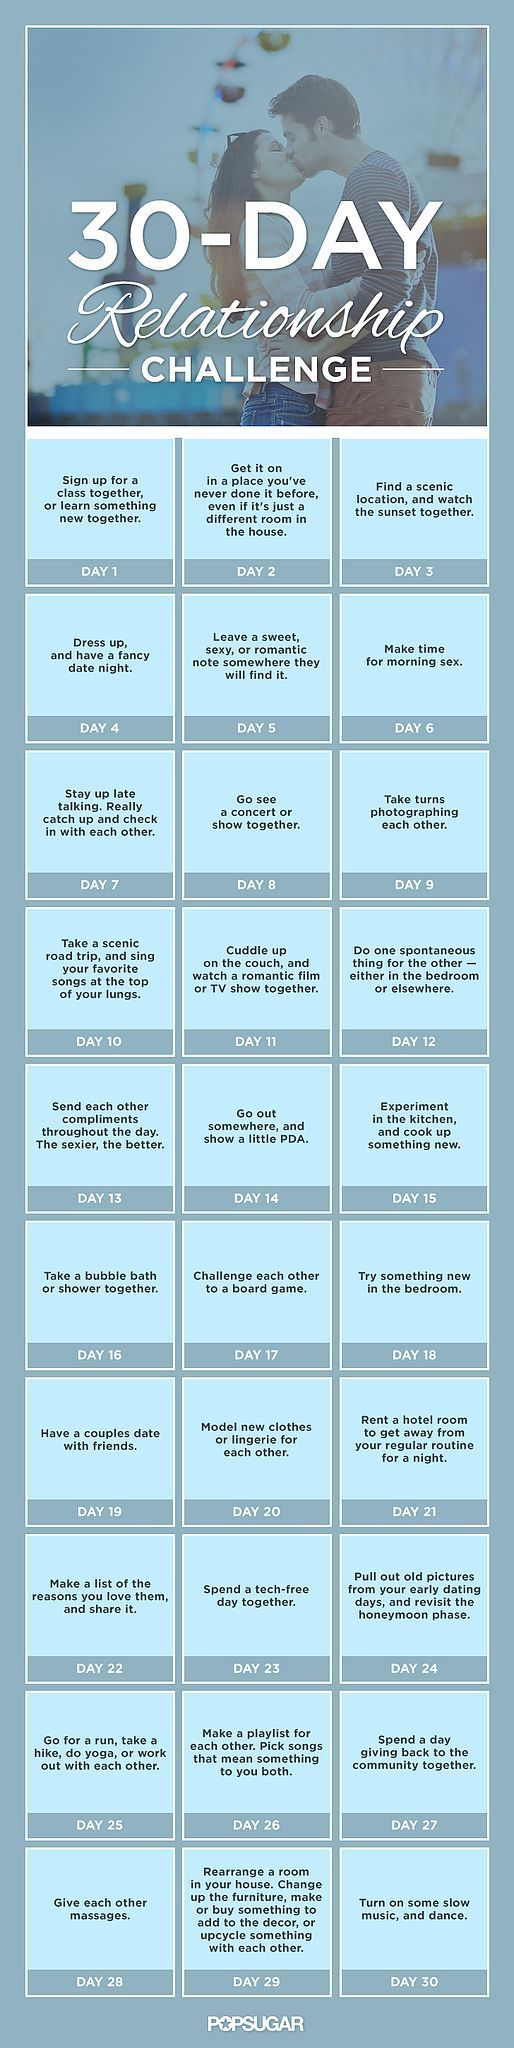 http://www.tressugar.com/30-Day-Relationship-Challenge-35253795